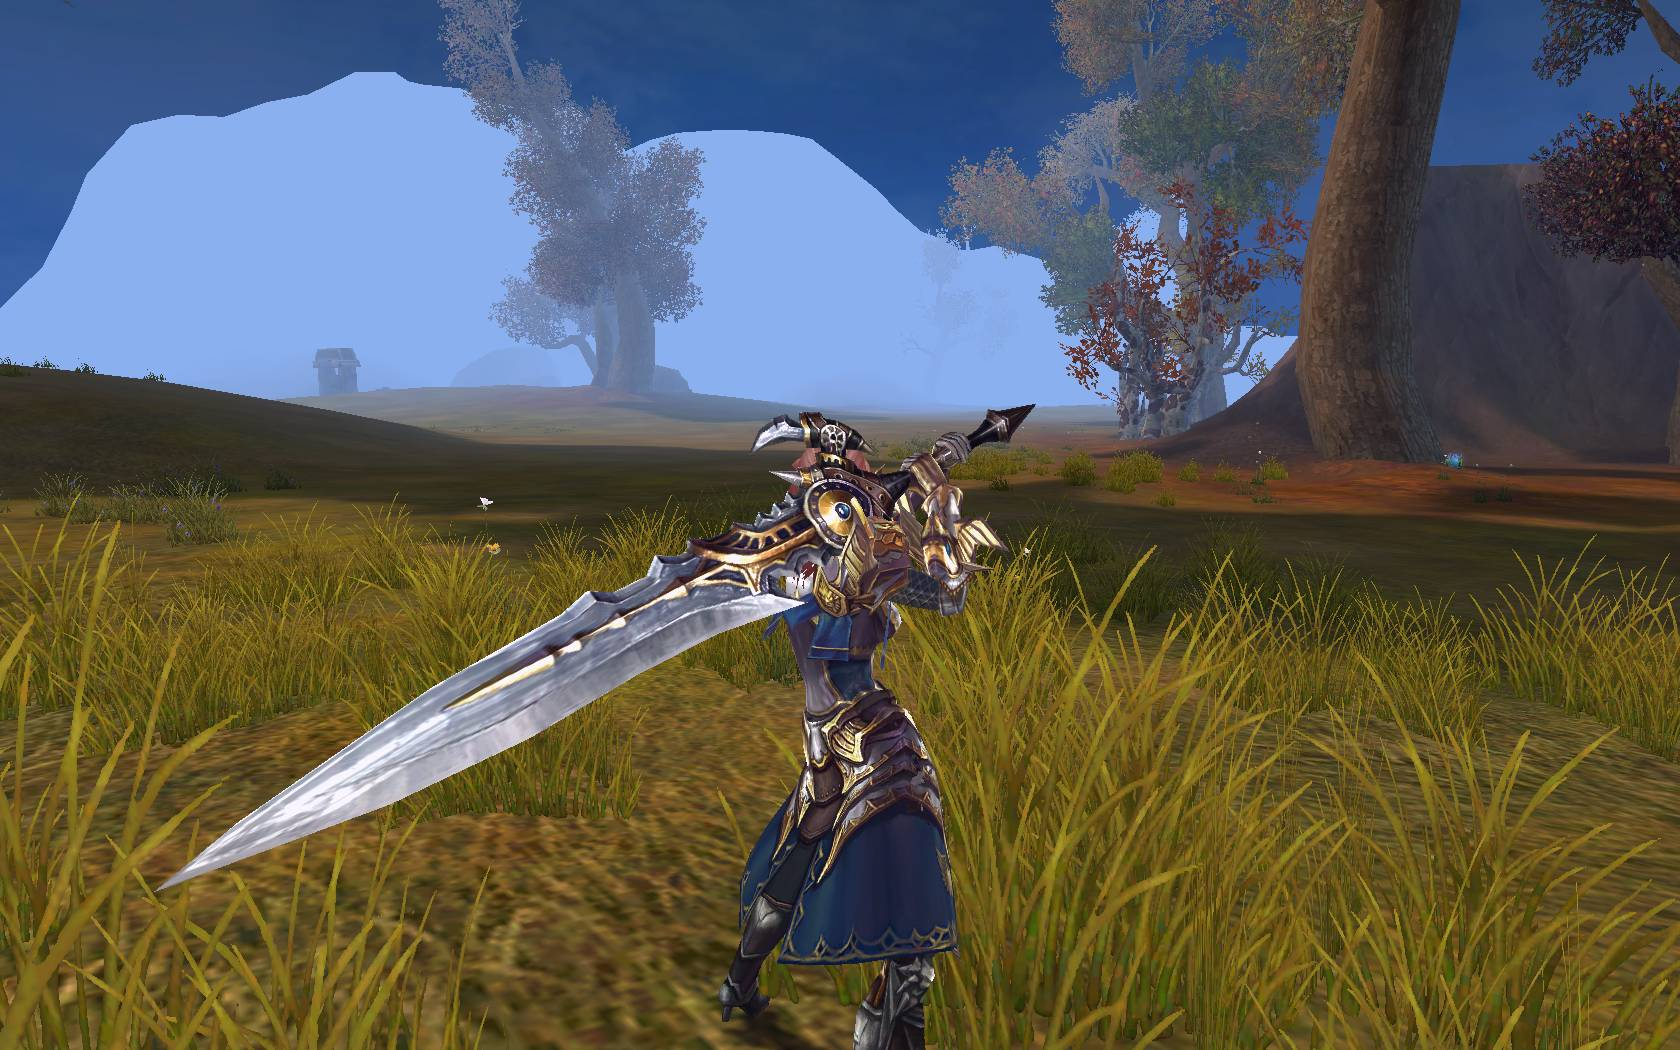 Click image for larger version.Name: Warriorclass Forsaken World07.jpgViews: 197Size: 244.0 KBID: 1057